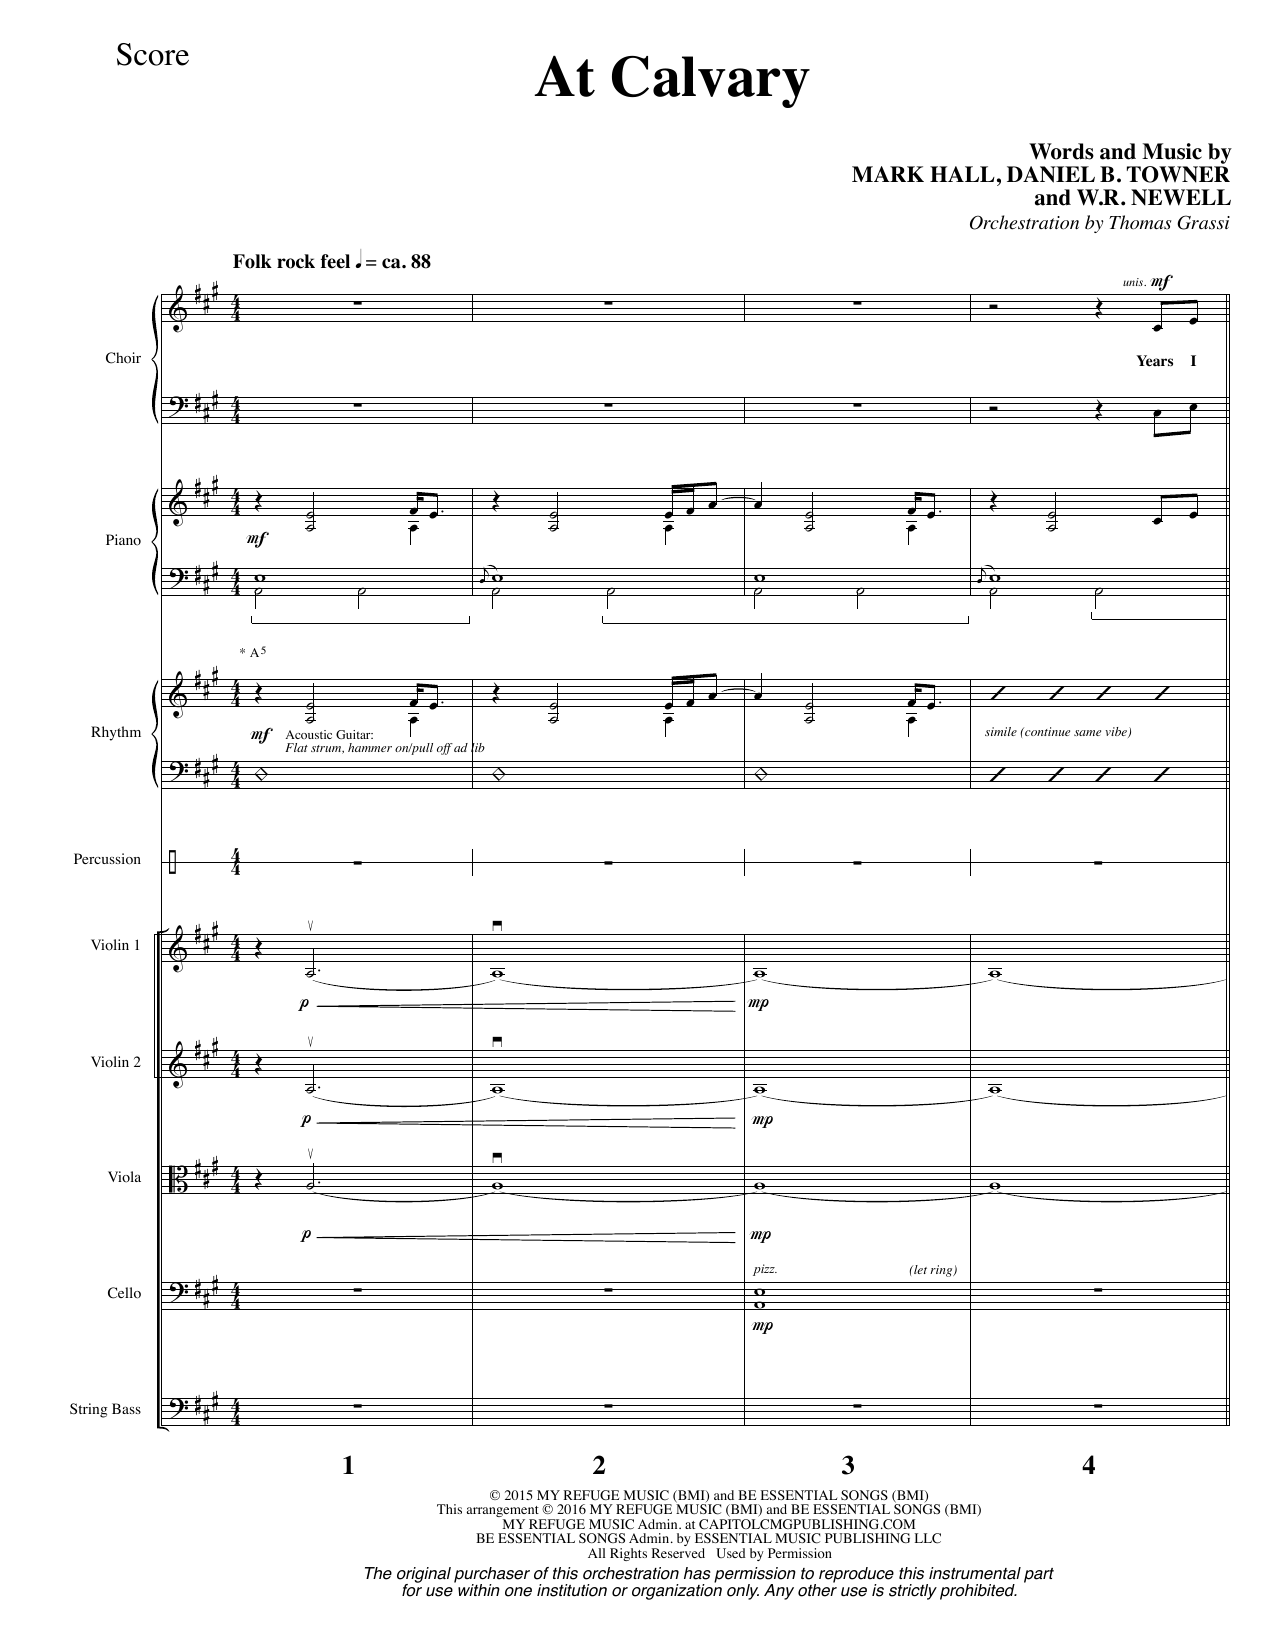 W.R. Newell - At Calvary - Full Score